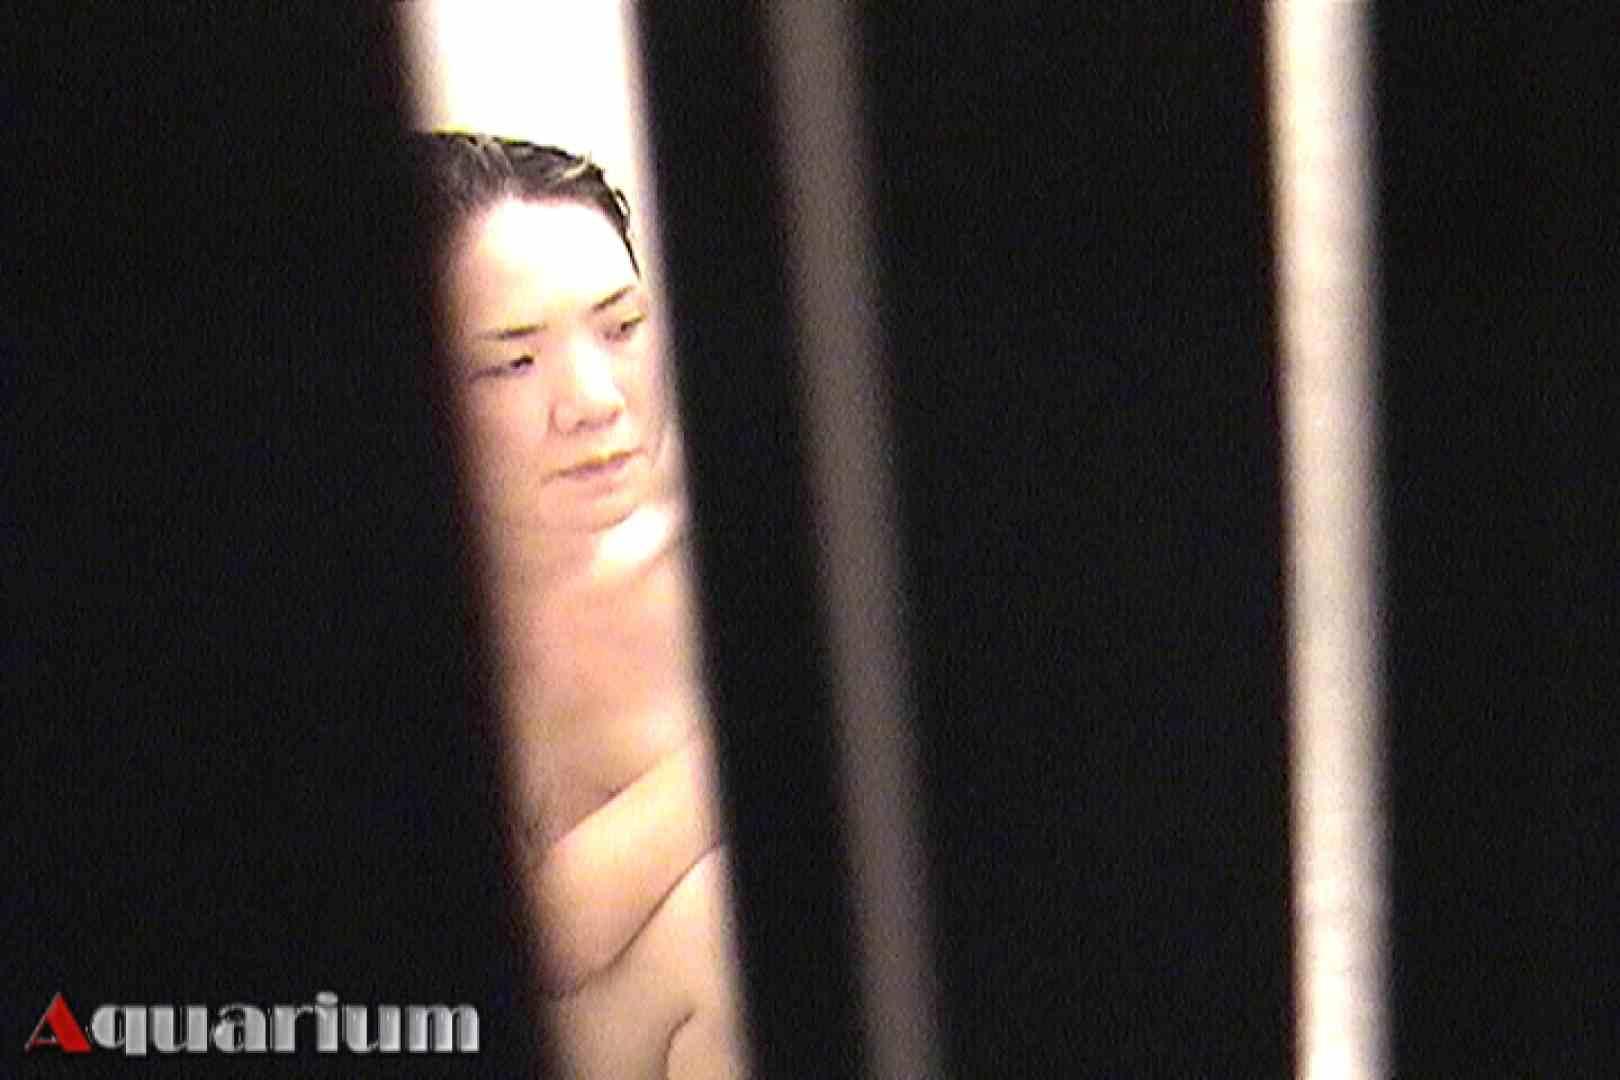 旅館脱衣所お着替え盗撮 Vol.04 盗撮 盗撮動画紹介 55pic 22